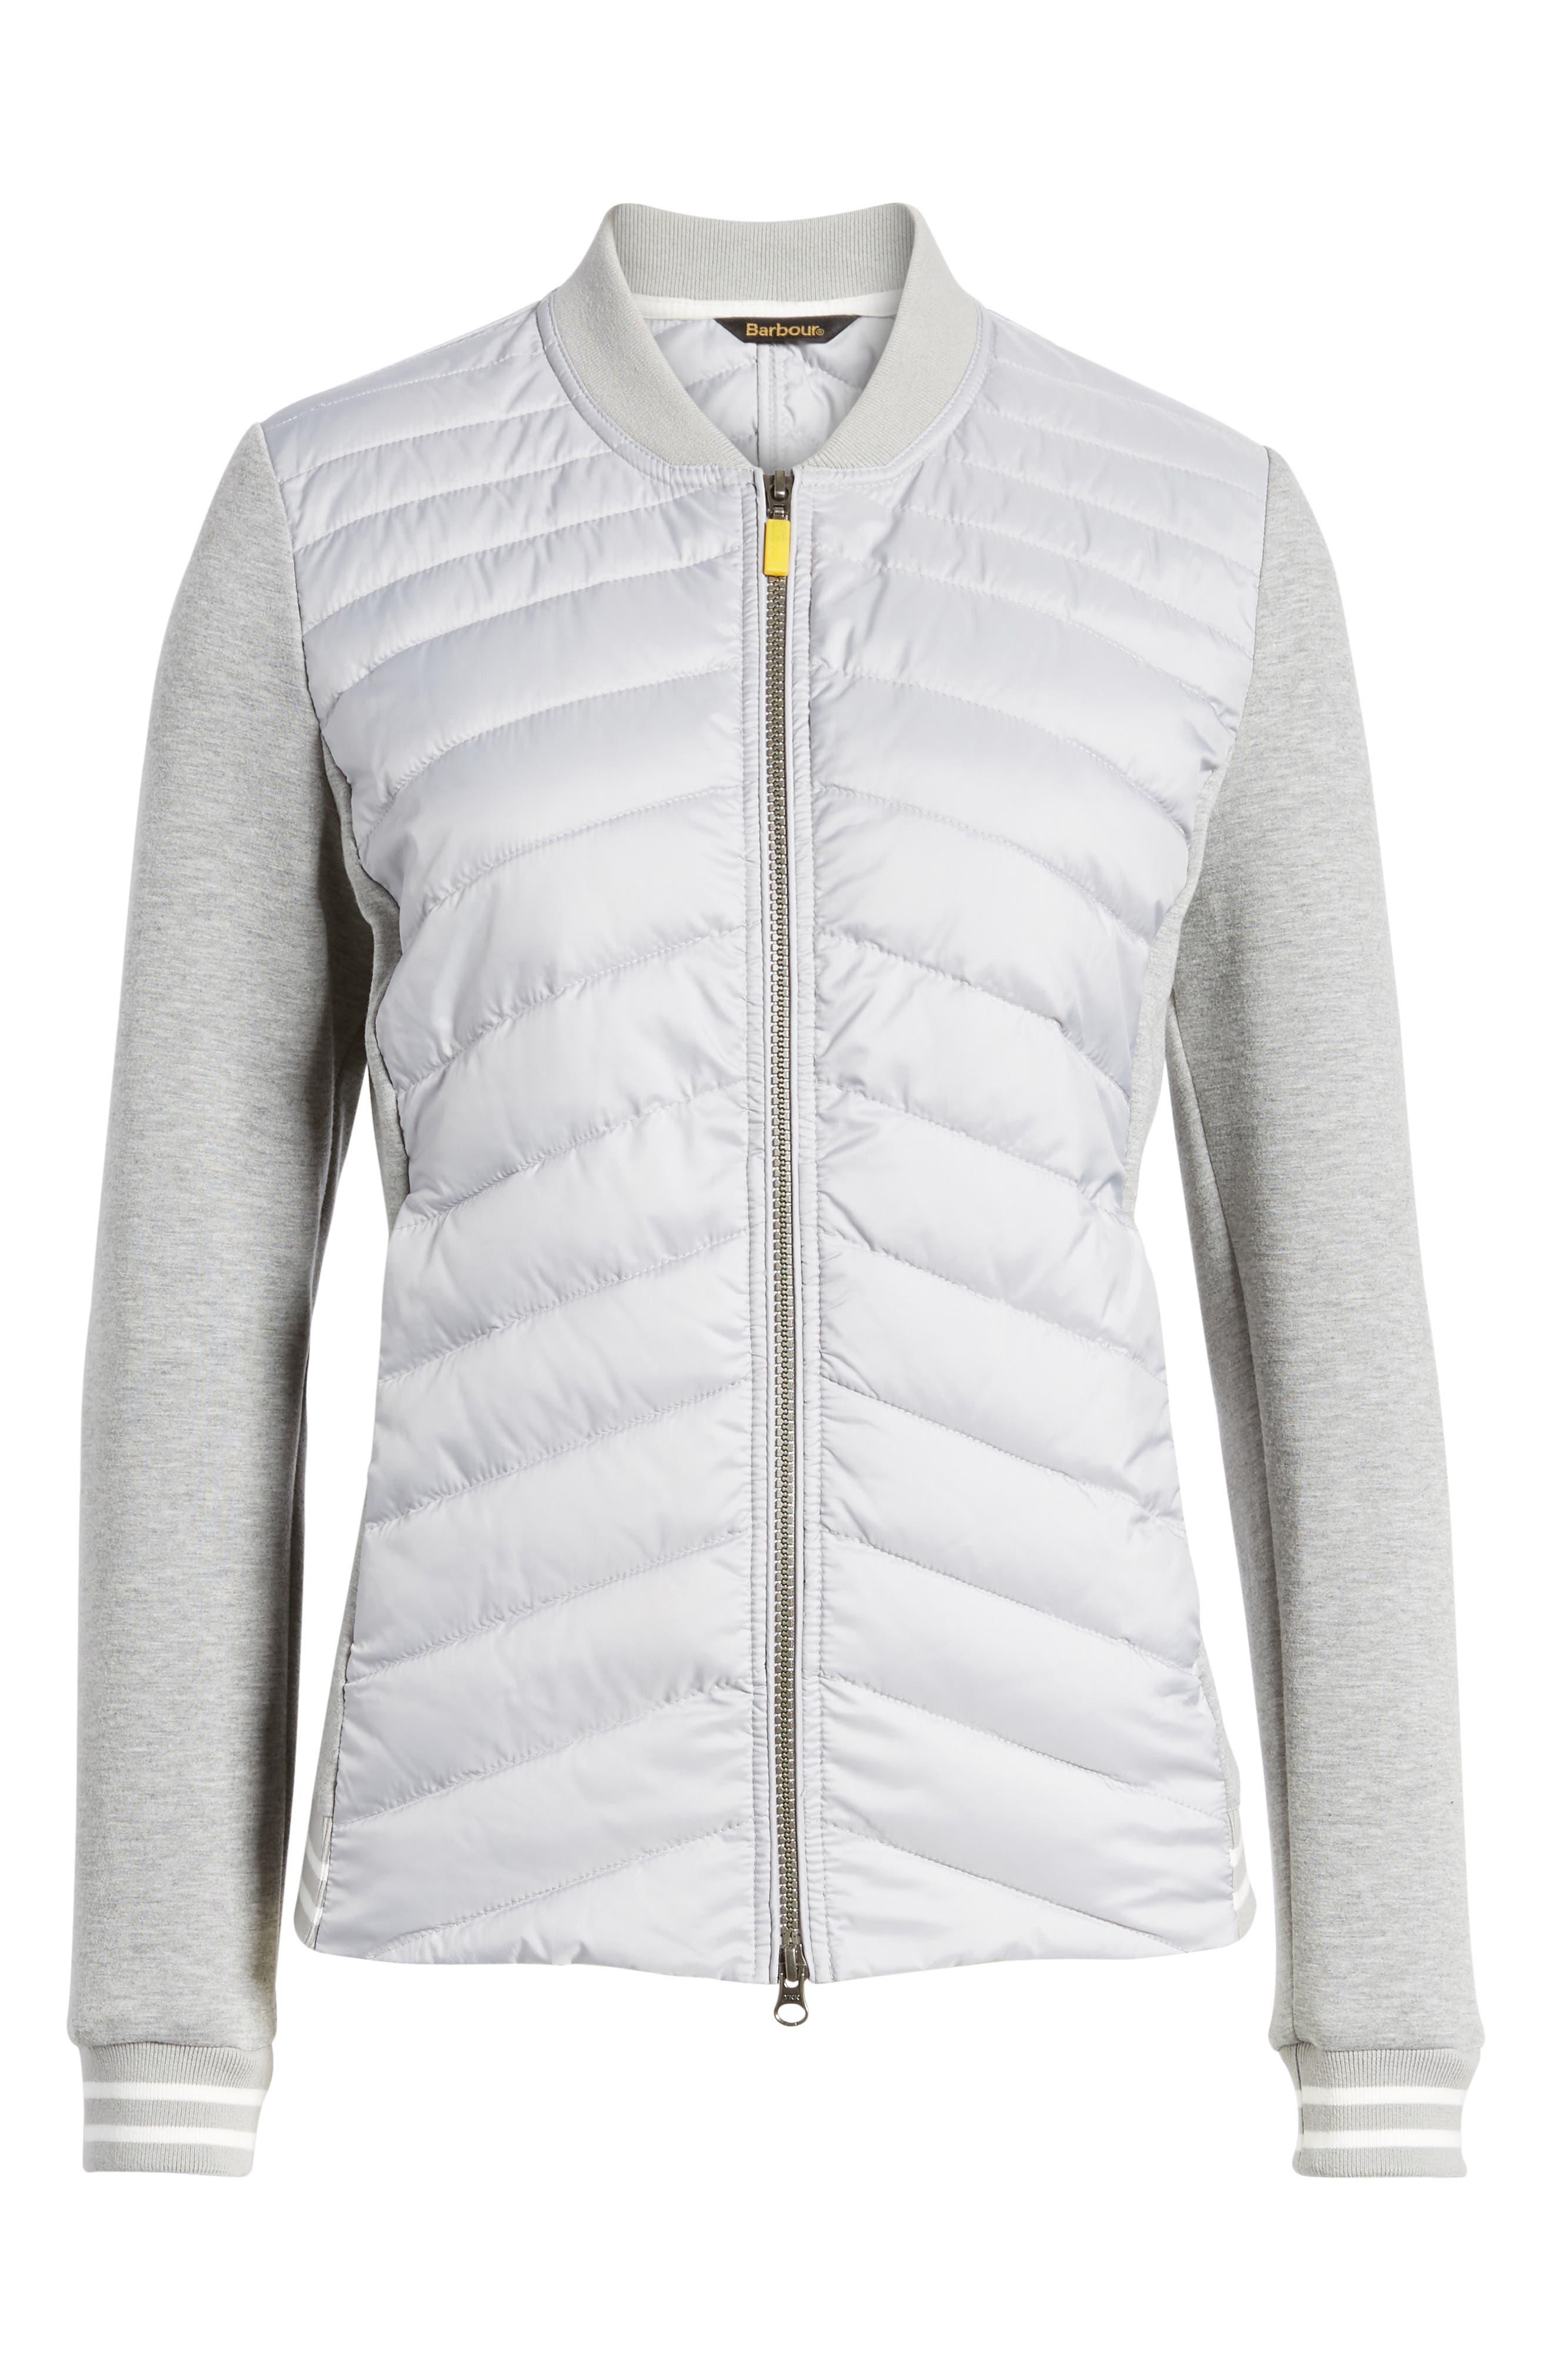 Pembrey Sweatshirt Jacket,                             Alternate thumbnail 5, color,                             050